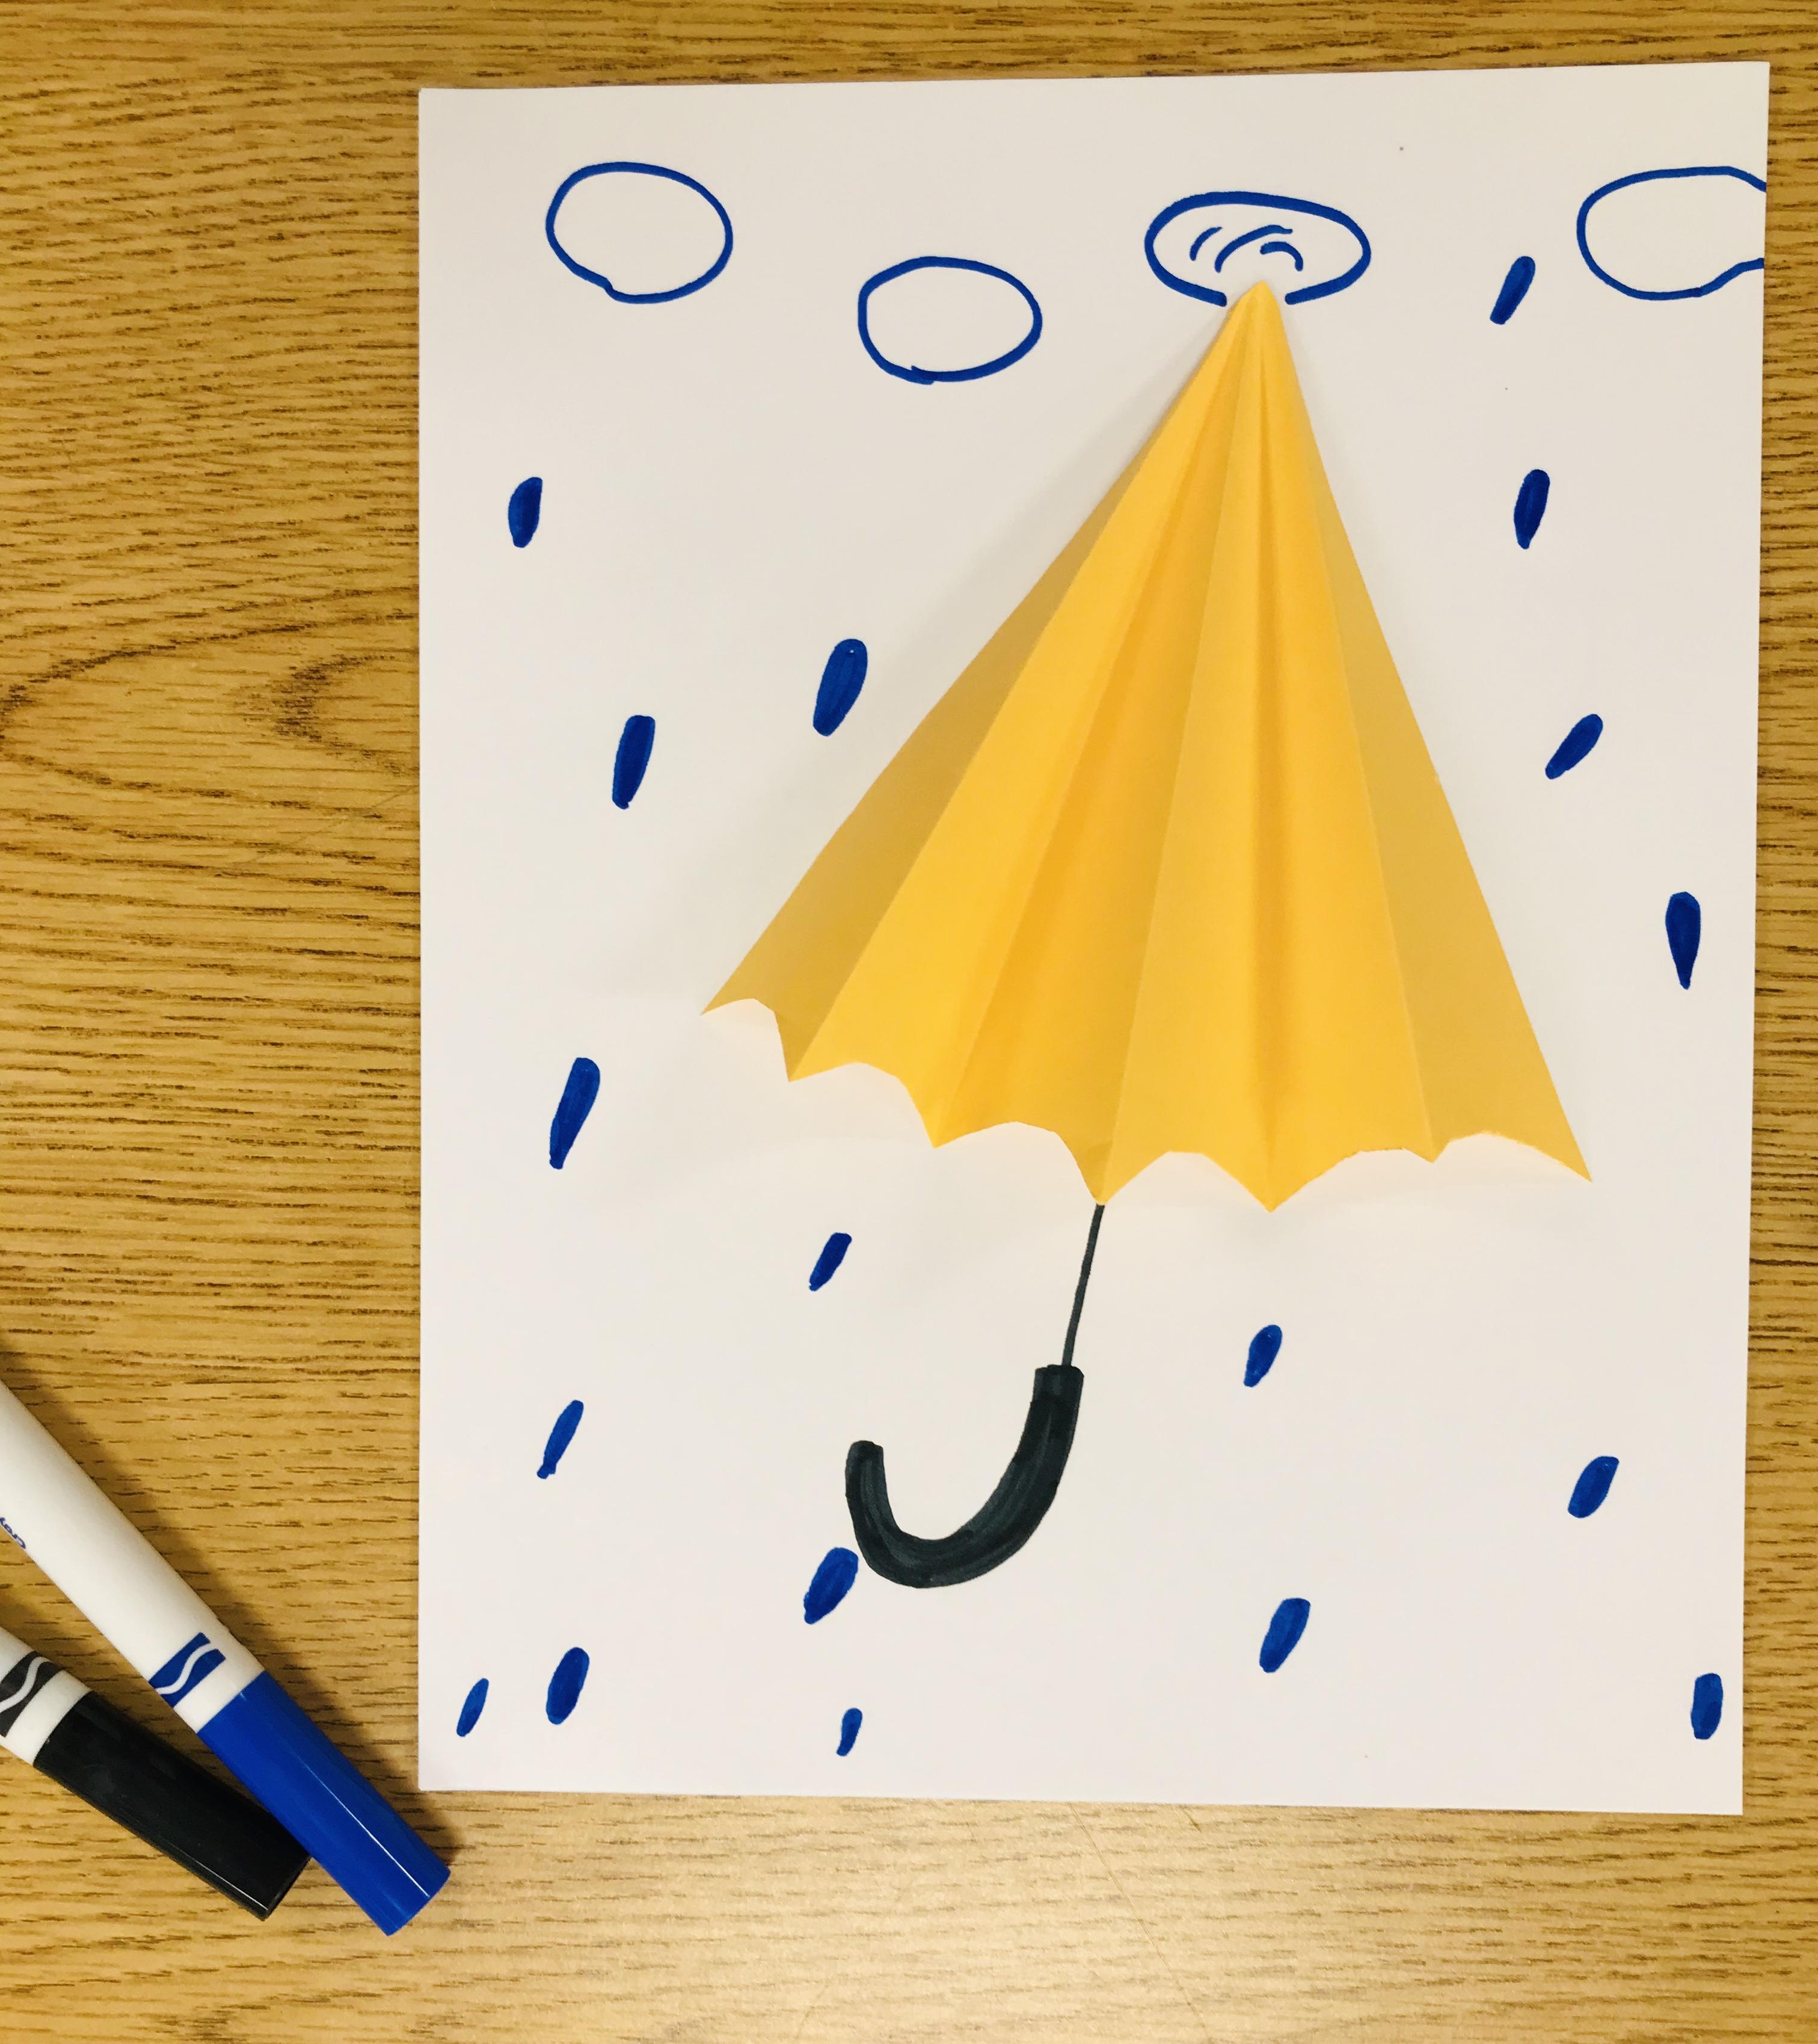 Complete 3D umbrella picture